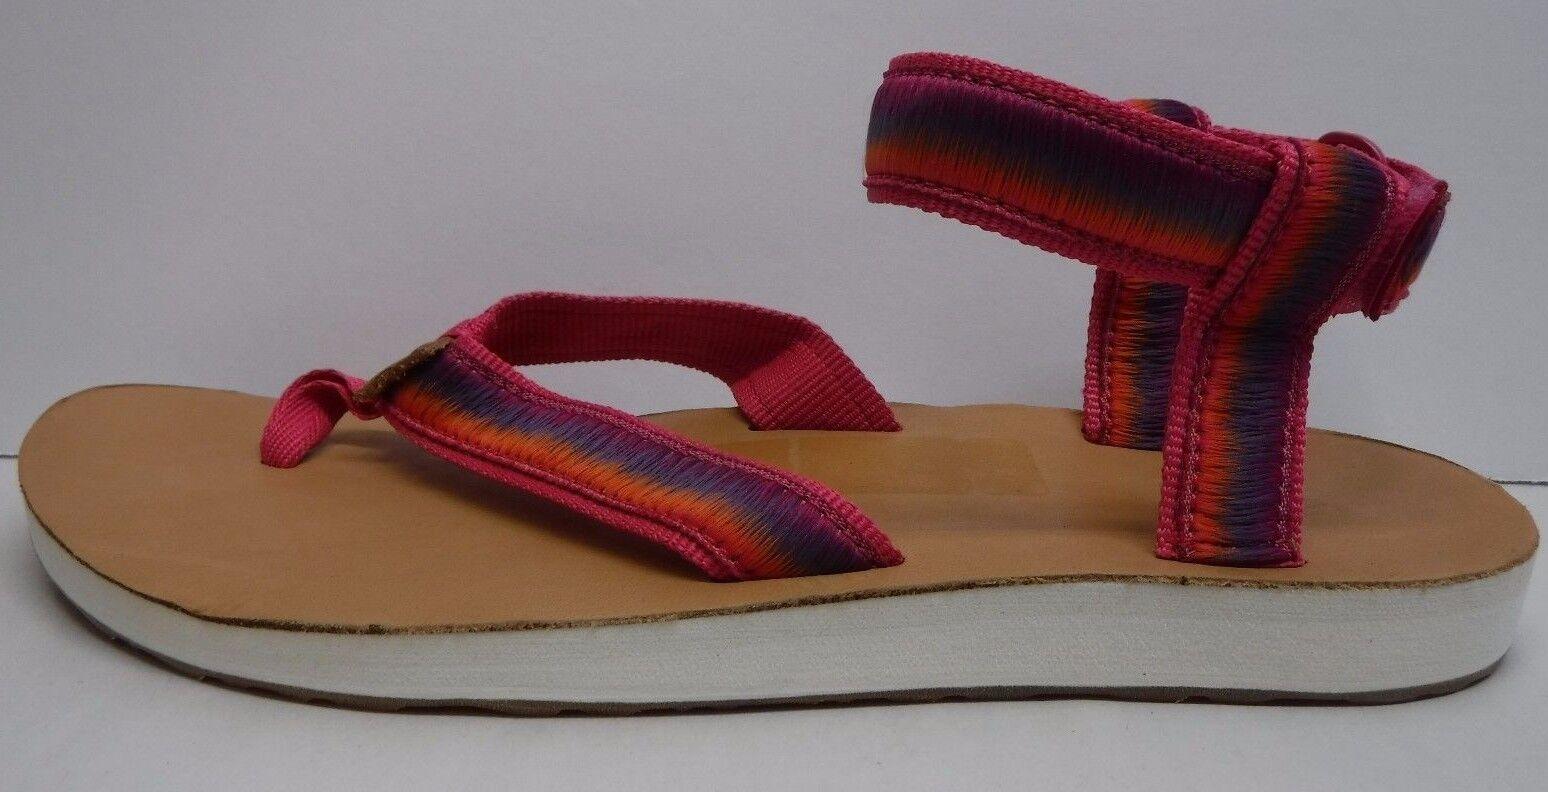 Teva Größe Sandales 8 Raspberry Sandales Größe New Damenschuhe Schuhes 8185ef